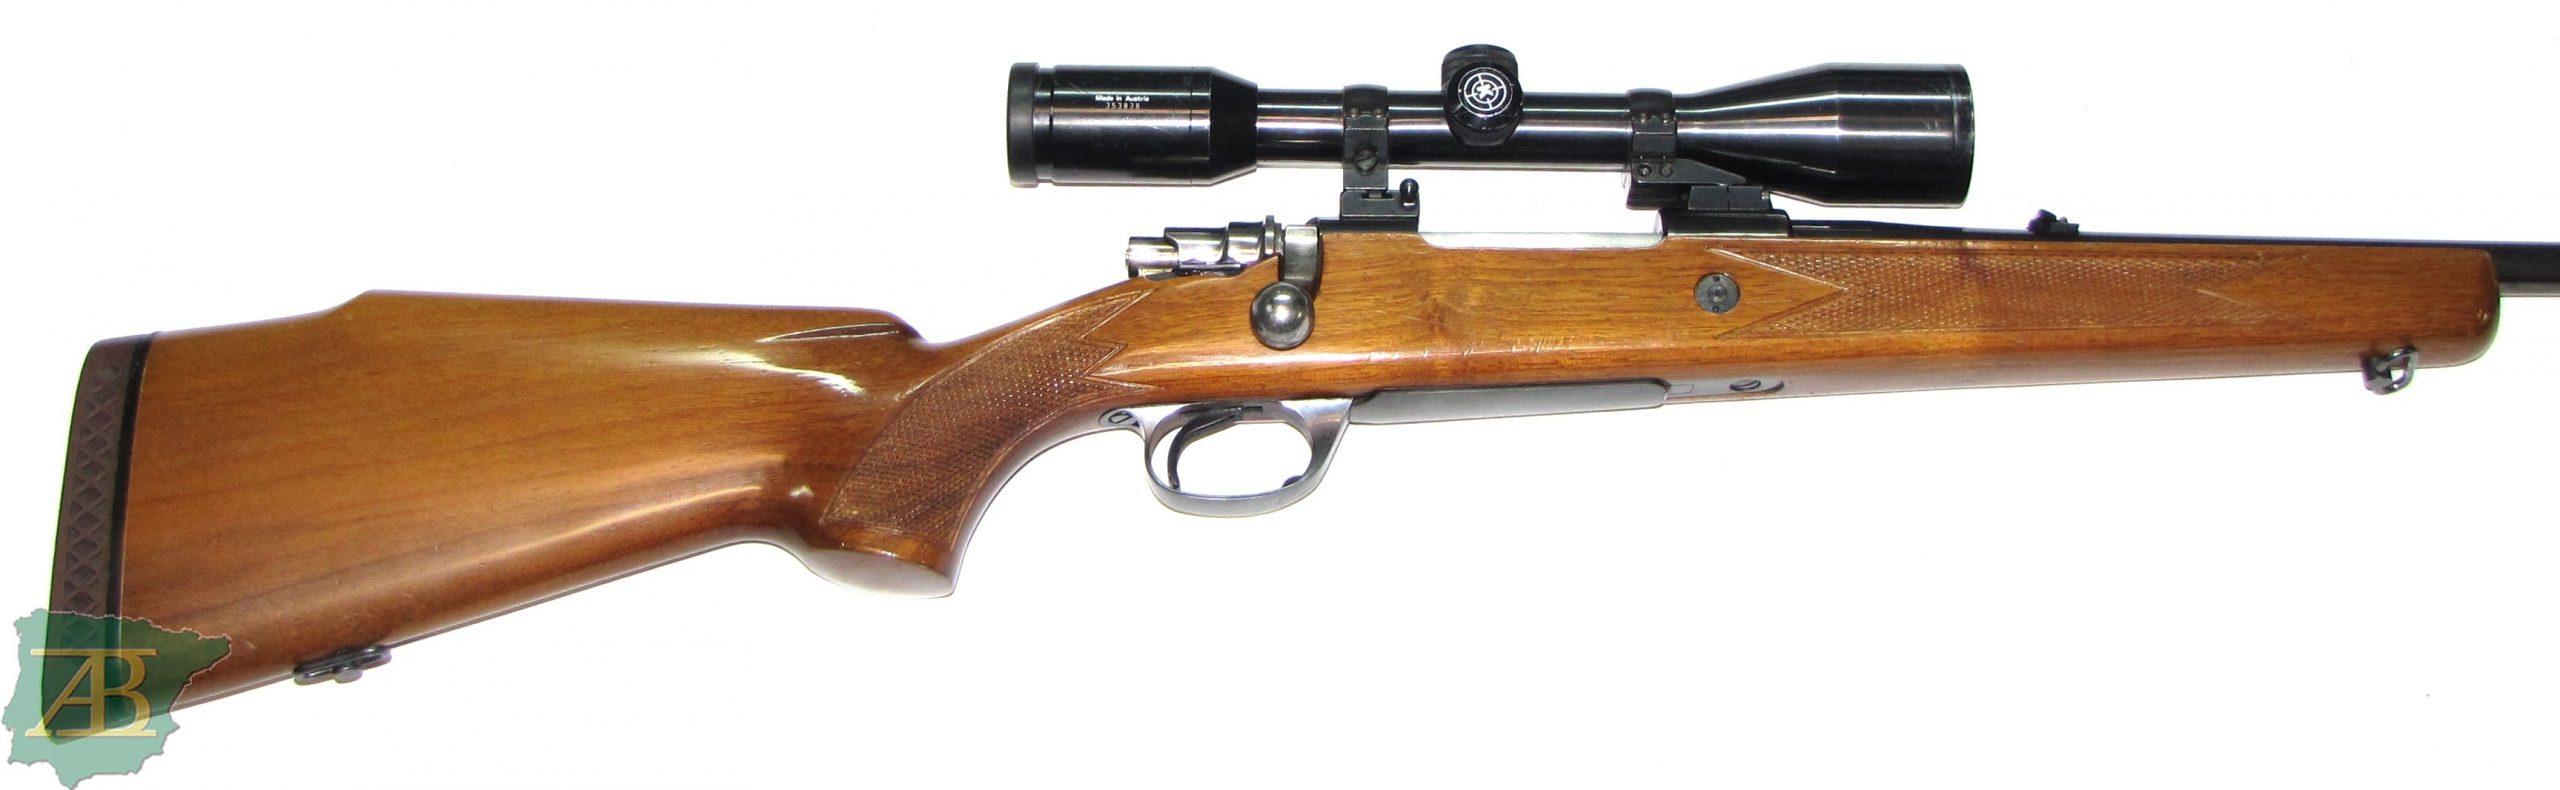 Rifle de cerrojo de caza SANTA BÁRBARA DE LUXE Ref 5578-armeriaiberica-2